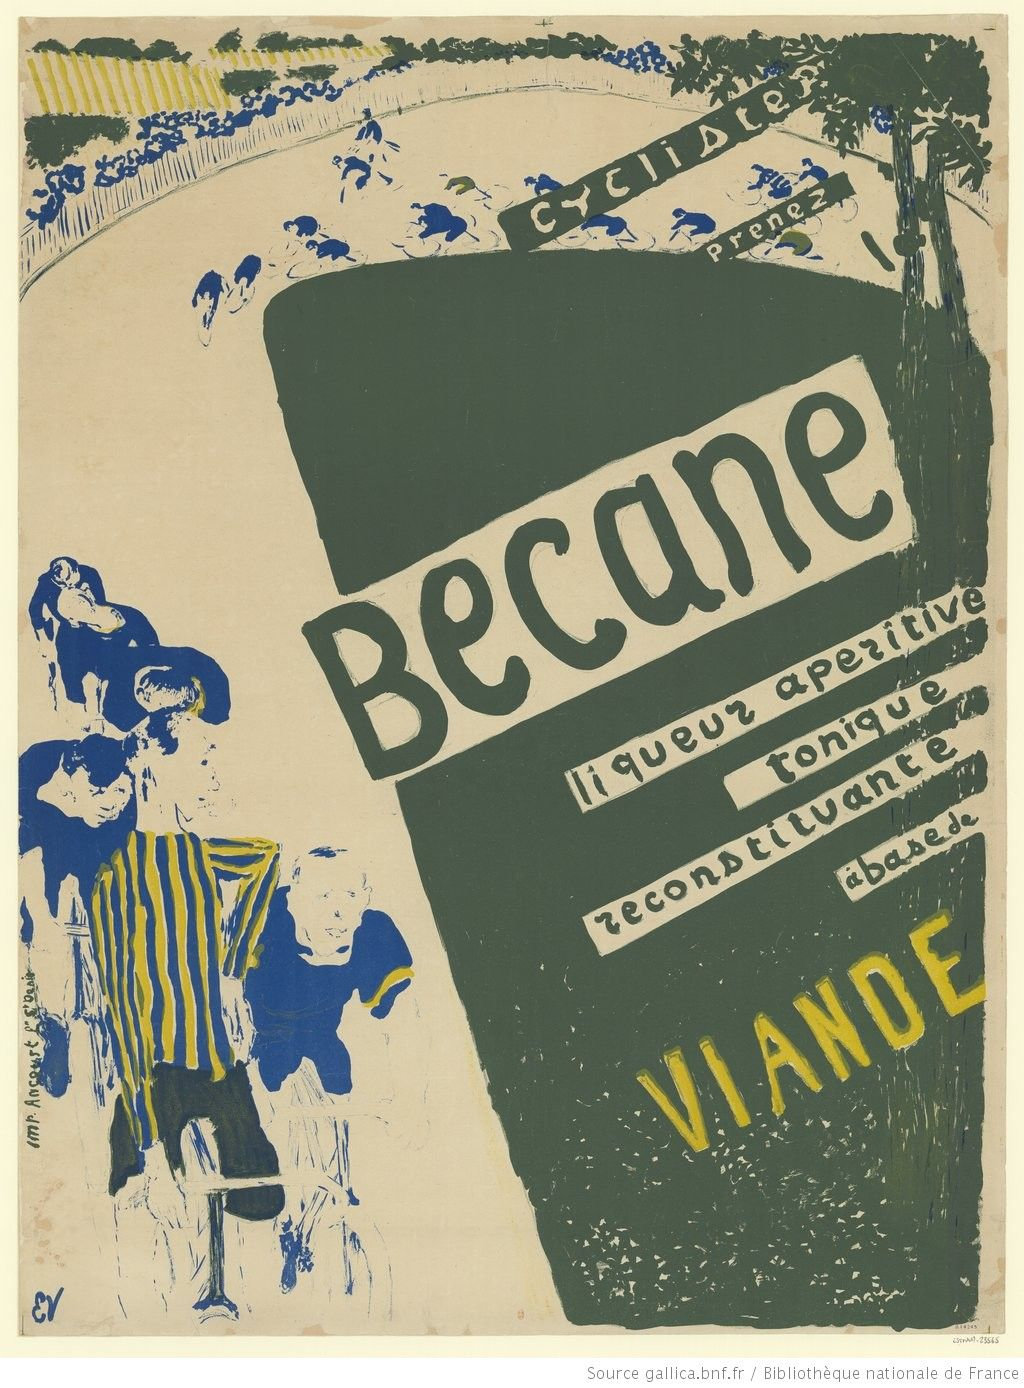 Edouard Vuillard 1868 1940 Cyclistes Prenez Becane Liqueur Aperitive Tonique Reconstituante Edouard Vuillard Lettering Bibliotheque Nationale De France